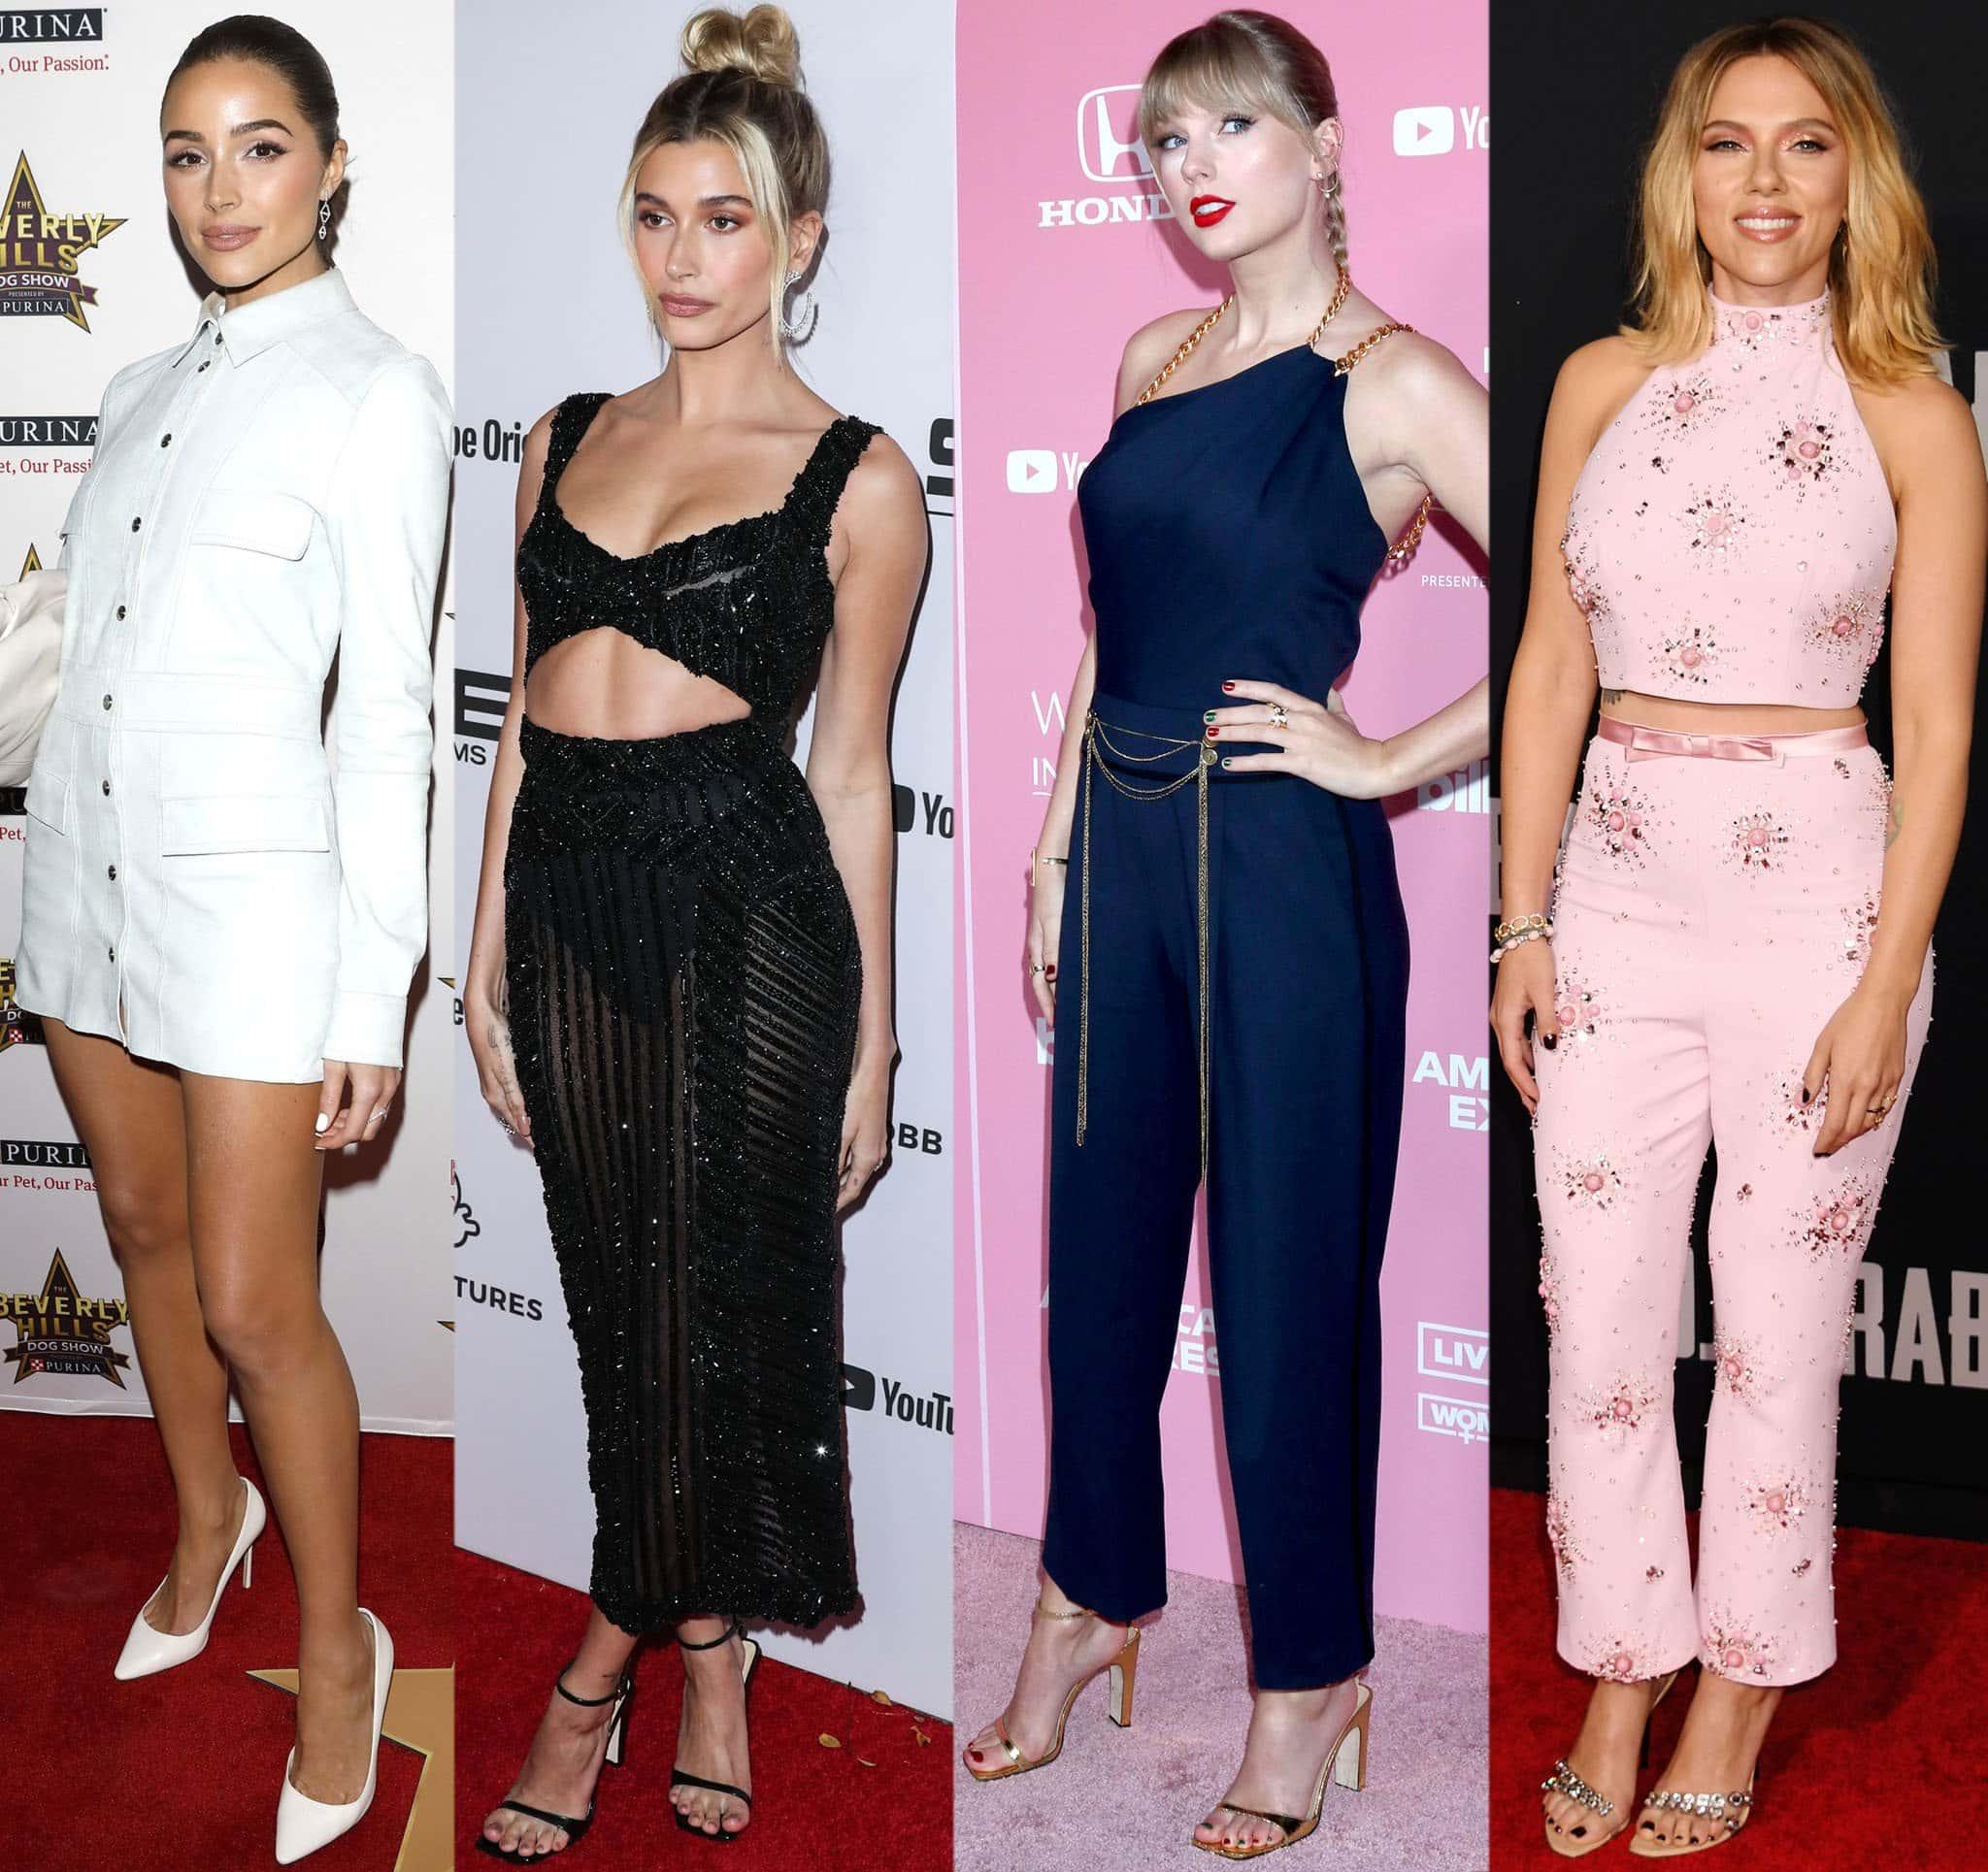 Hollywood stars Olivia Culpo, Hailey Bieber, Taylor Swift, and Scarlett Johansson in Sergio Rossi heels